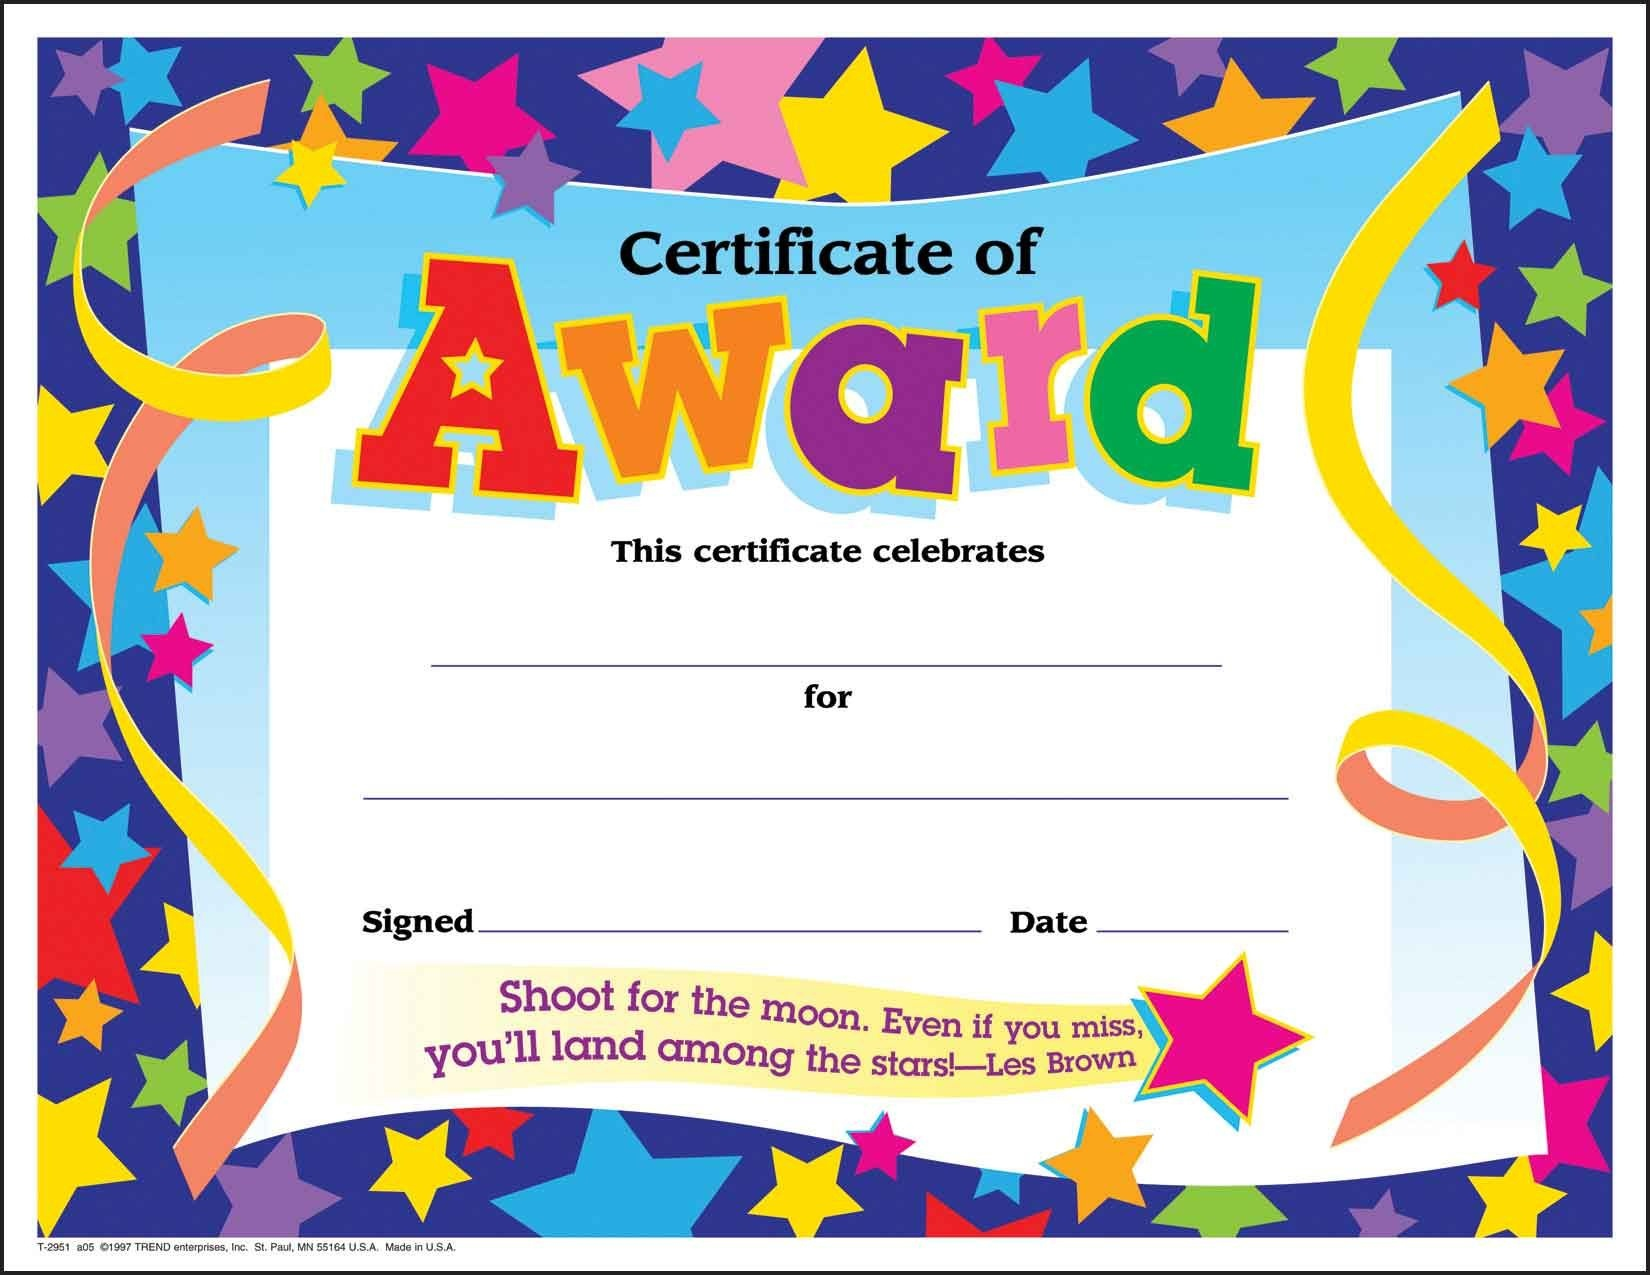 Printable Student Certificates - Tutlin.psstech.co - Free Printable Student Award Certificate Template